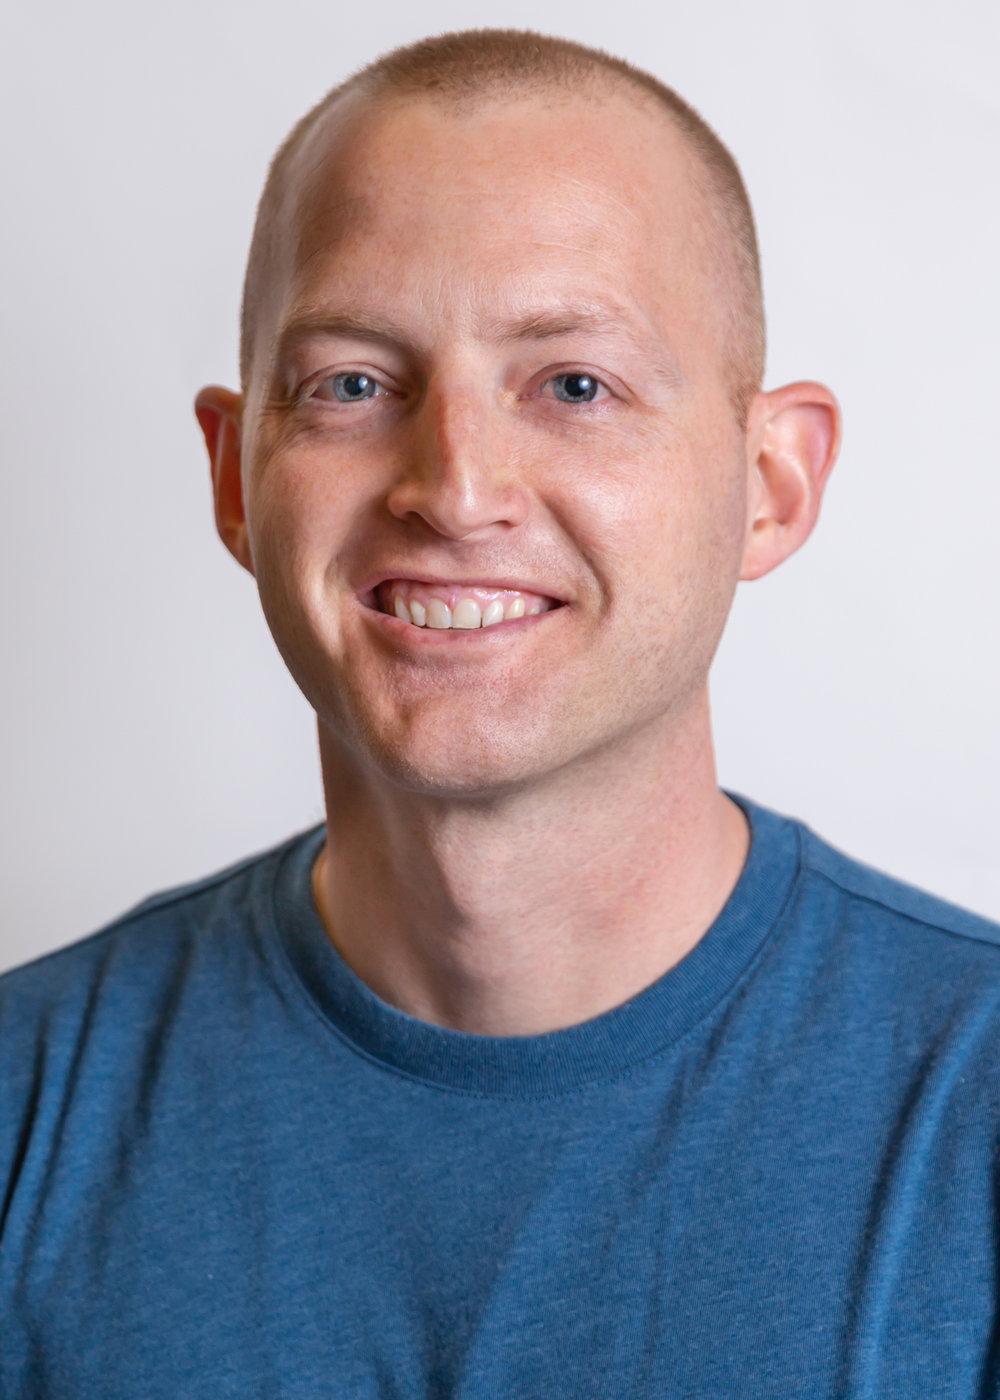 Jay O'Neil | Lighting & Set Logistics On staff since 2014